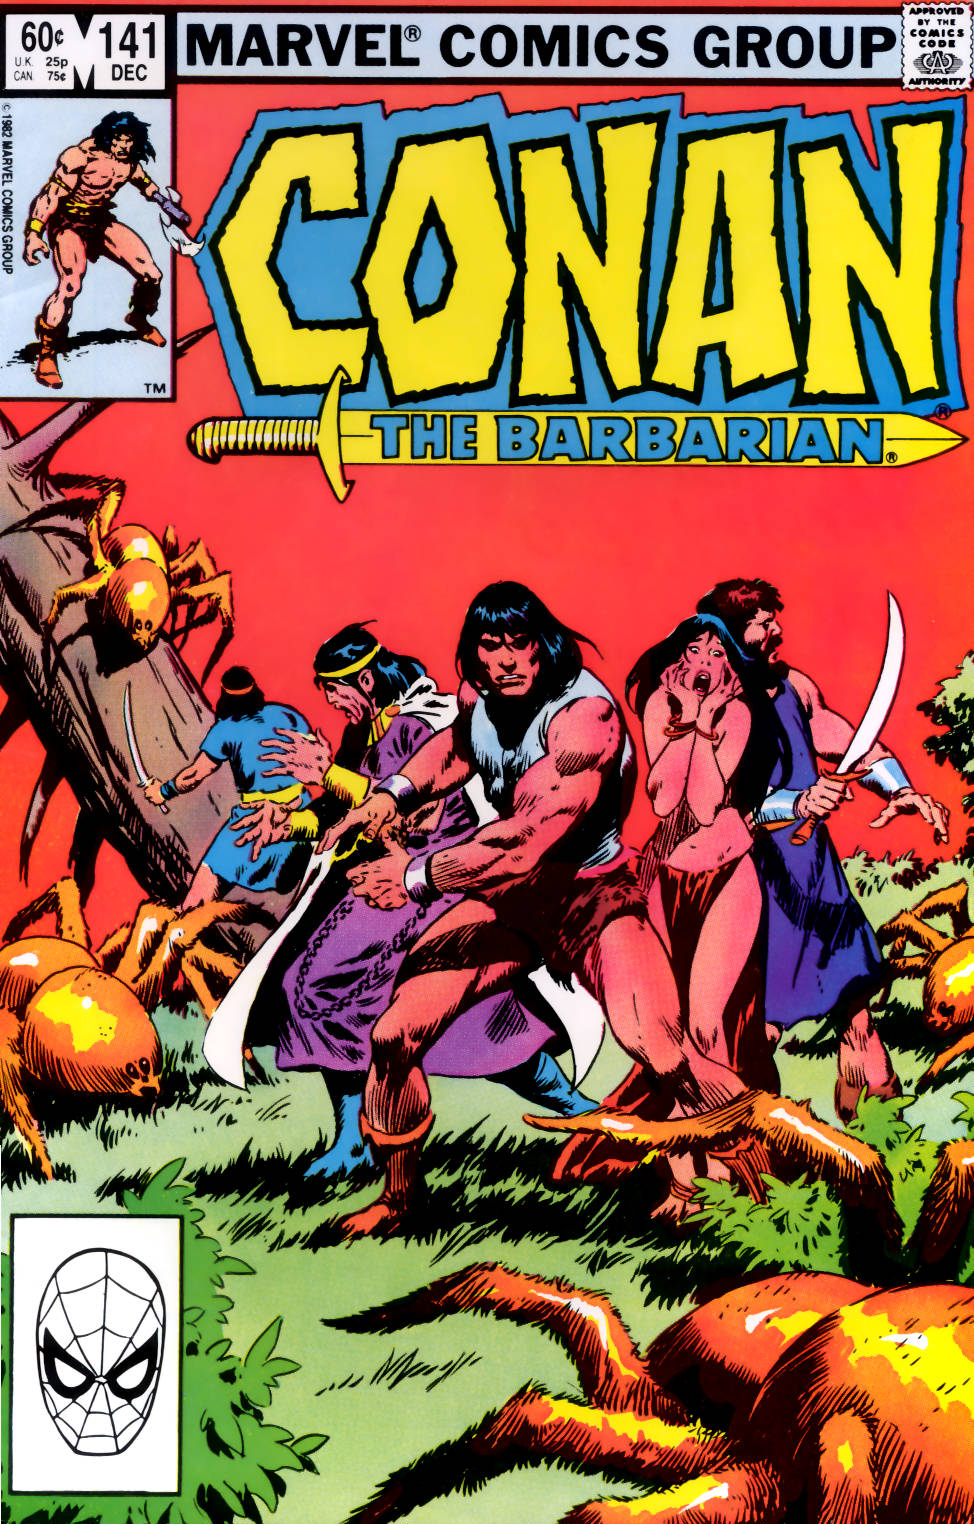 Conan the Barbarian 141